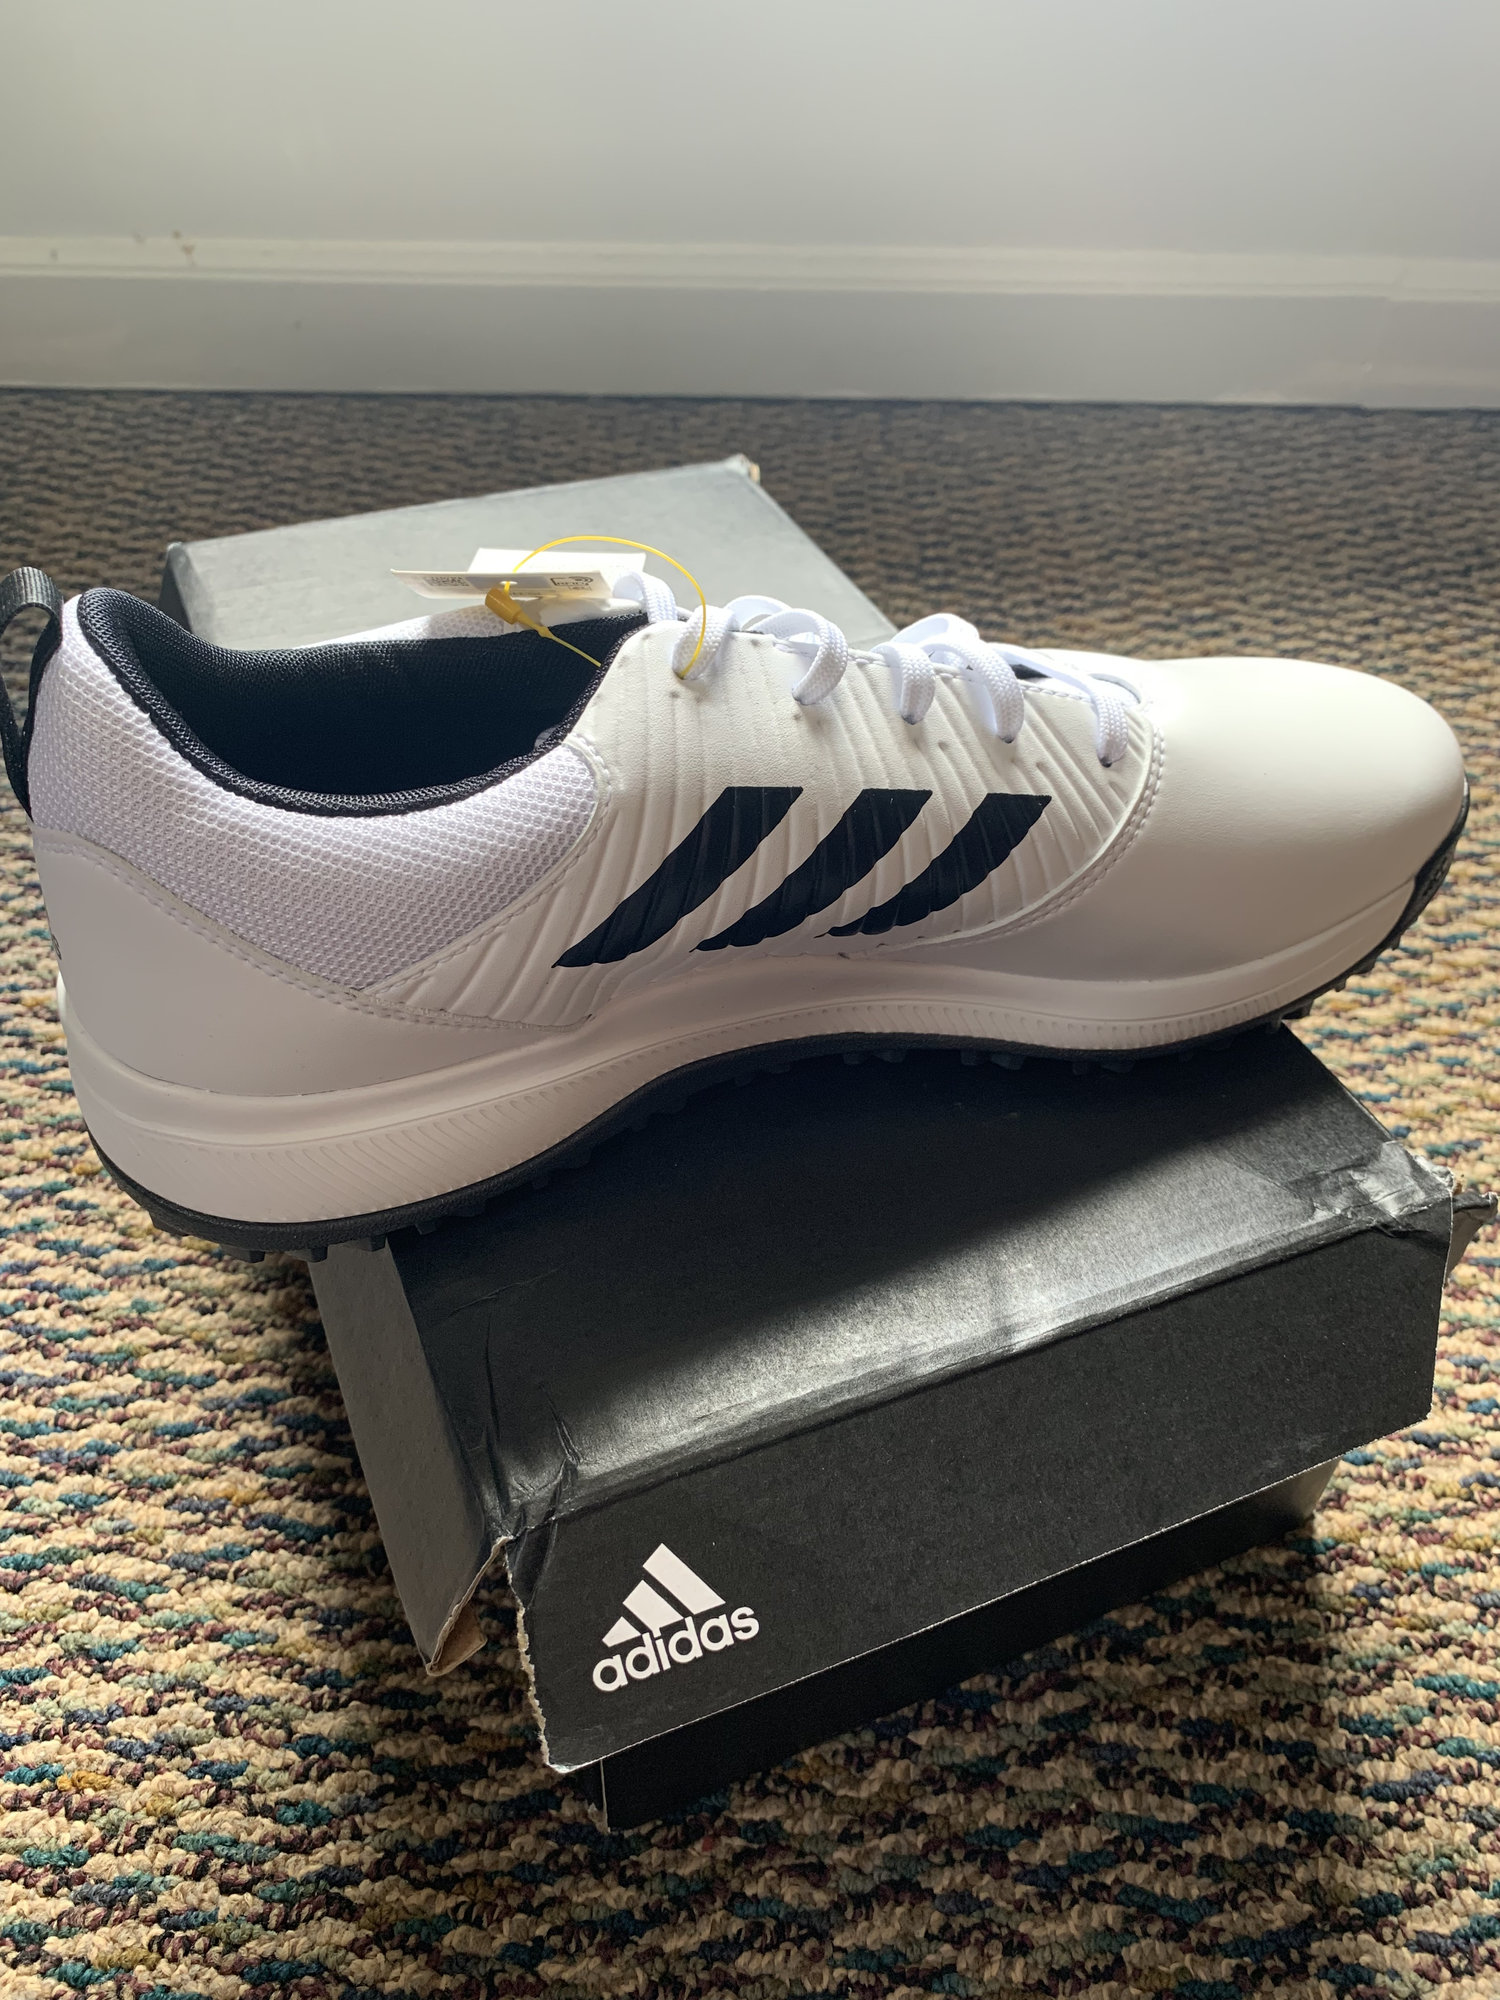 adidas CP Traxion SL Golf Shoes - new